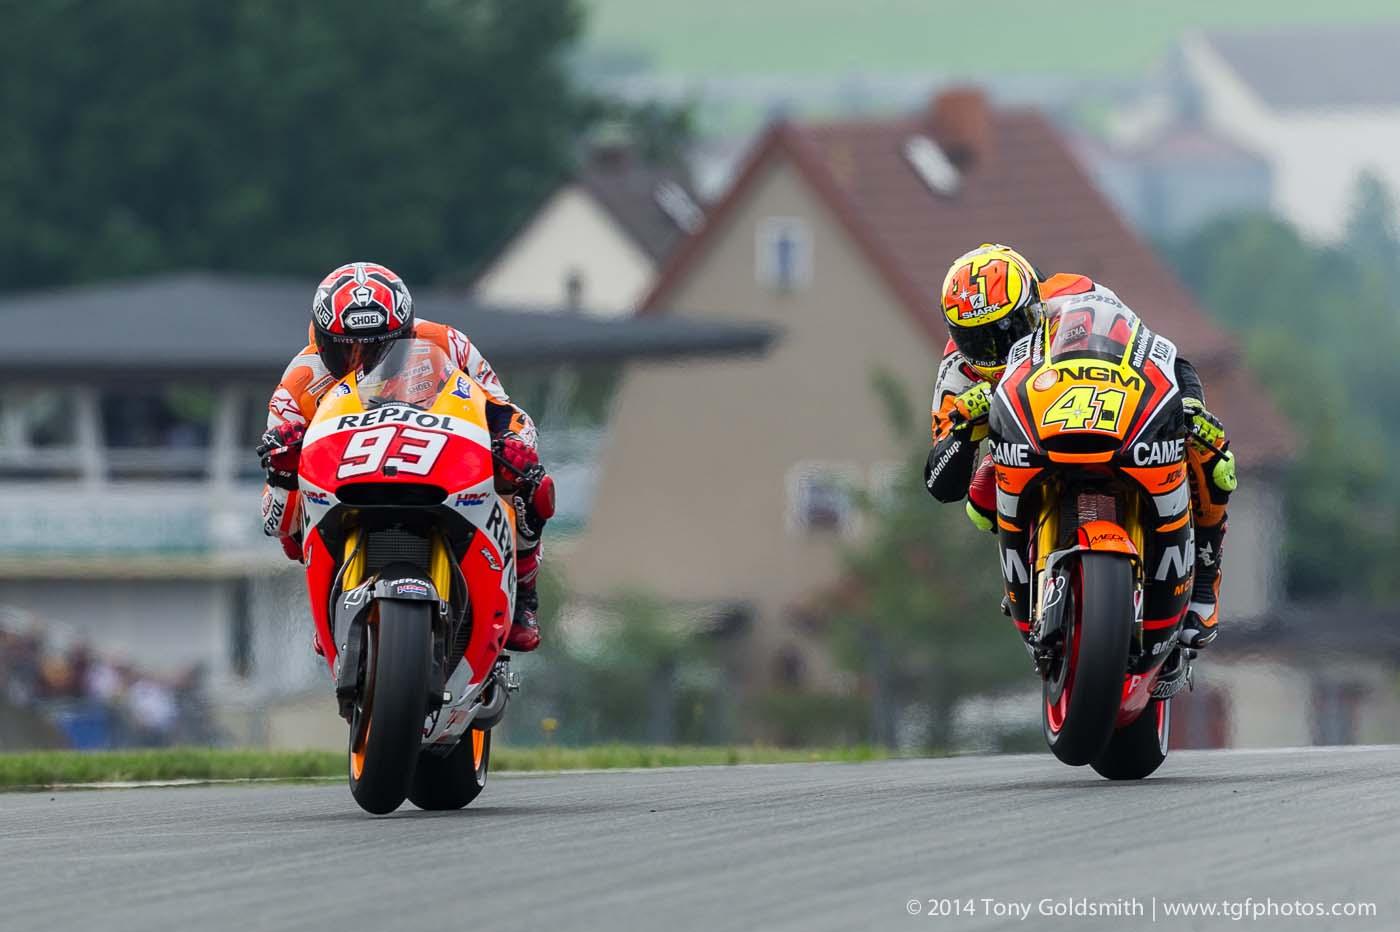 [GP] Sachsenring Saturday-Sachsenring-MotoGP-German-GP-Tony-Goldsmith-06